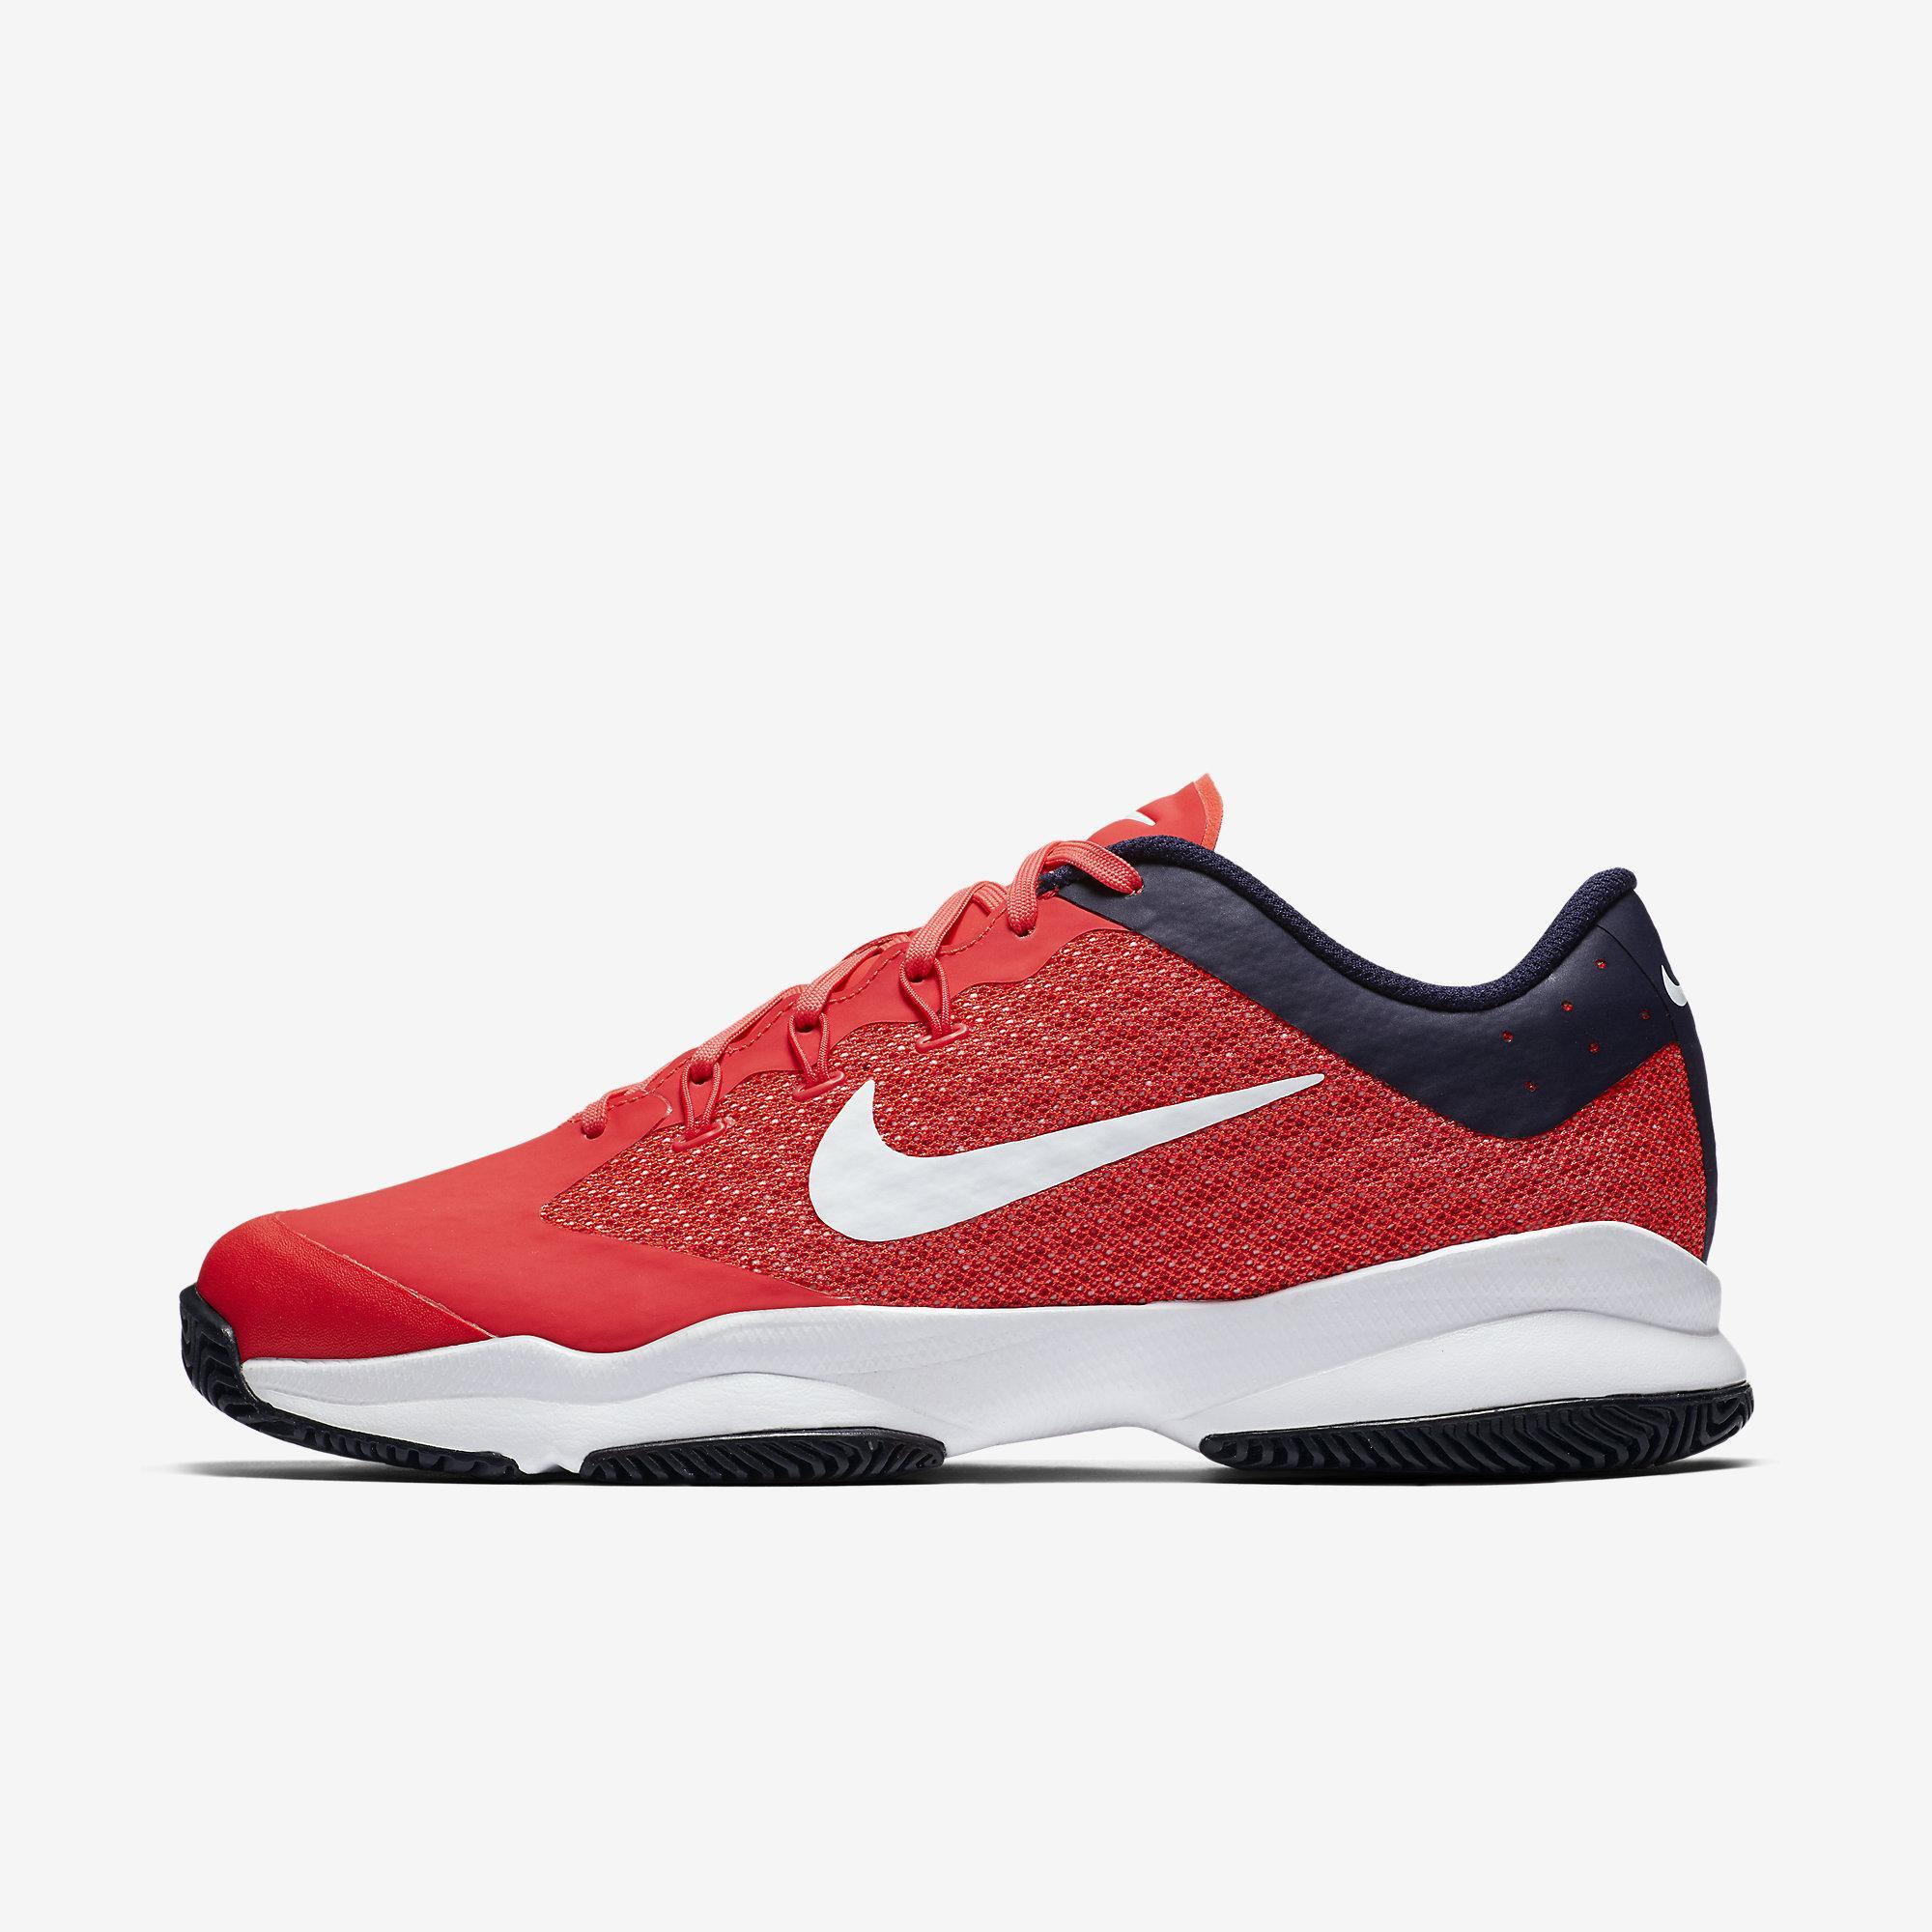 0e181b2d4f9d Nike Mens Air Zoom Ultra Tennis Shoes - Bright Crimson - Tennisnuts.com